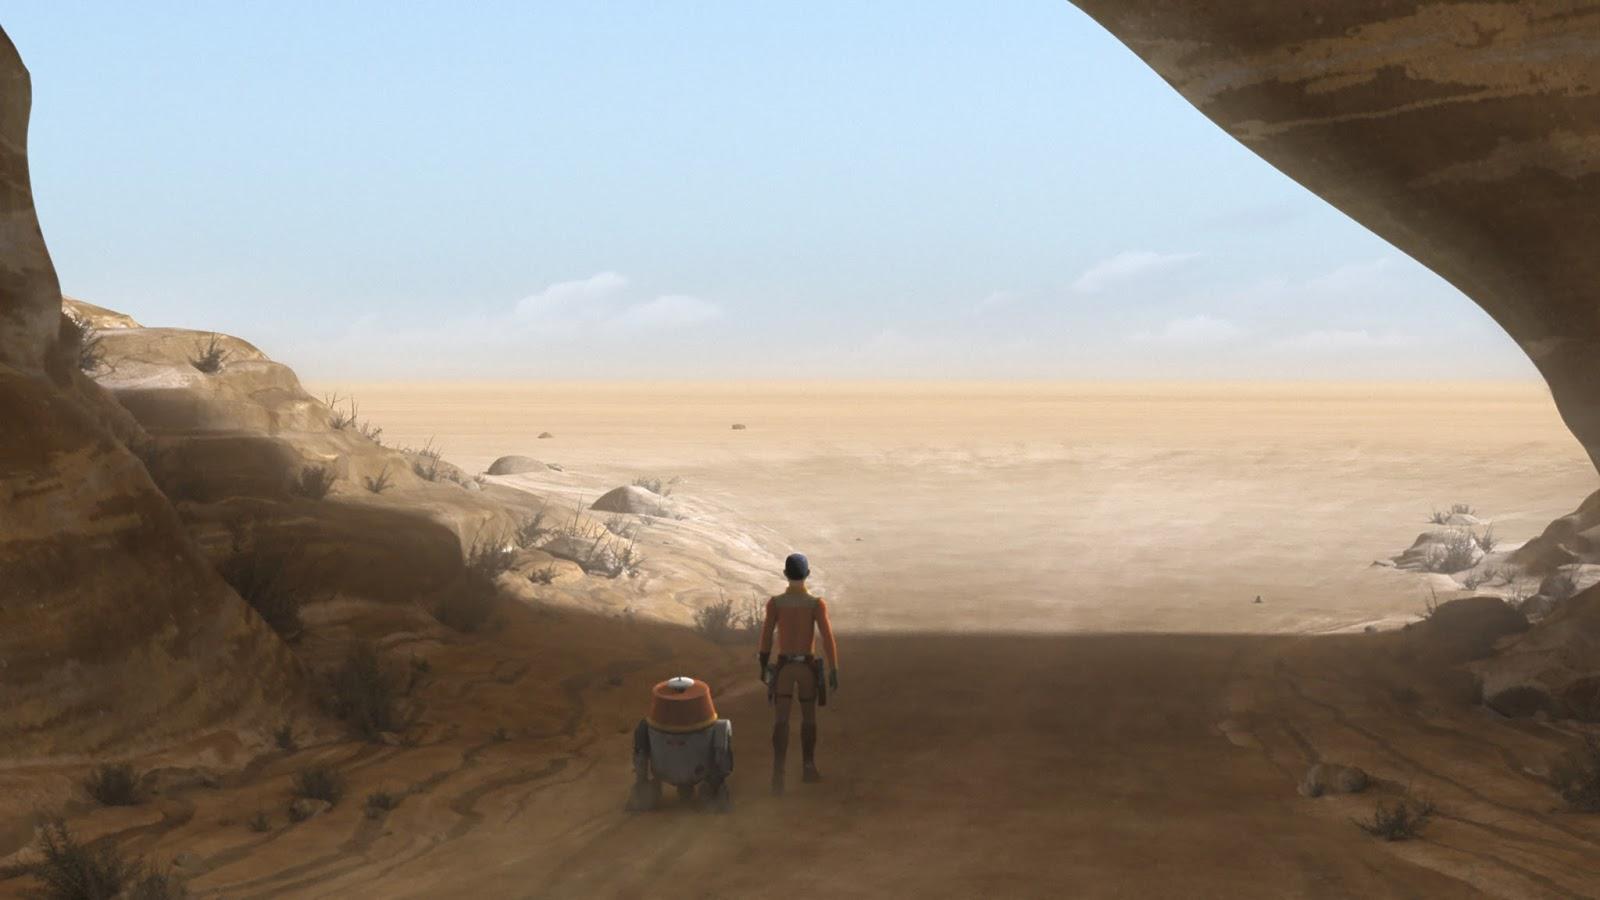 Obi Wan Kenobi And Maul Meet Again In Star Wars Rebels